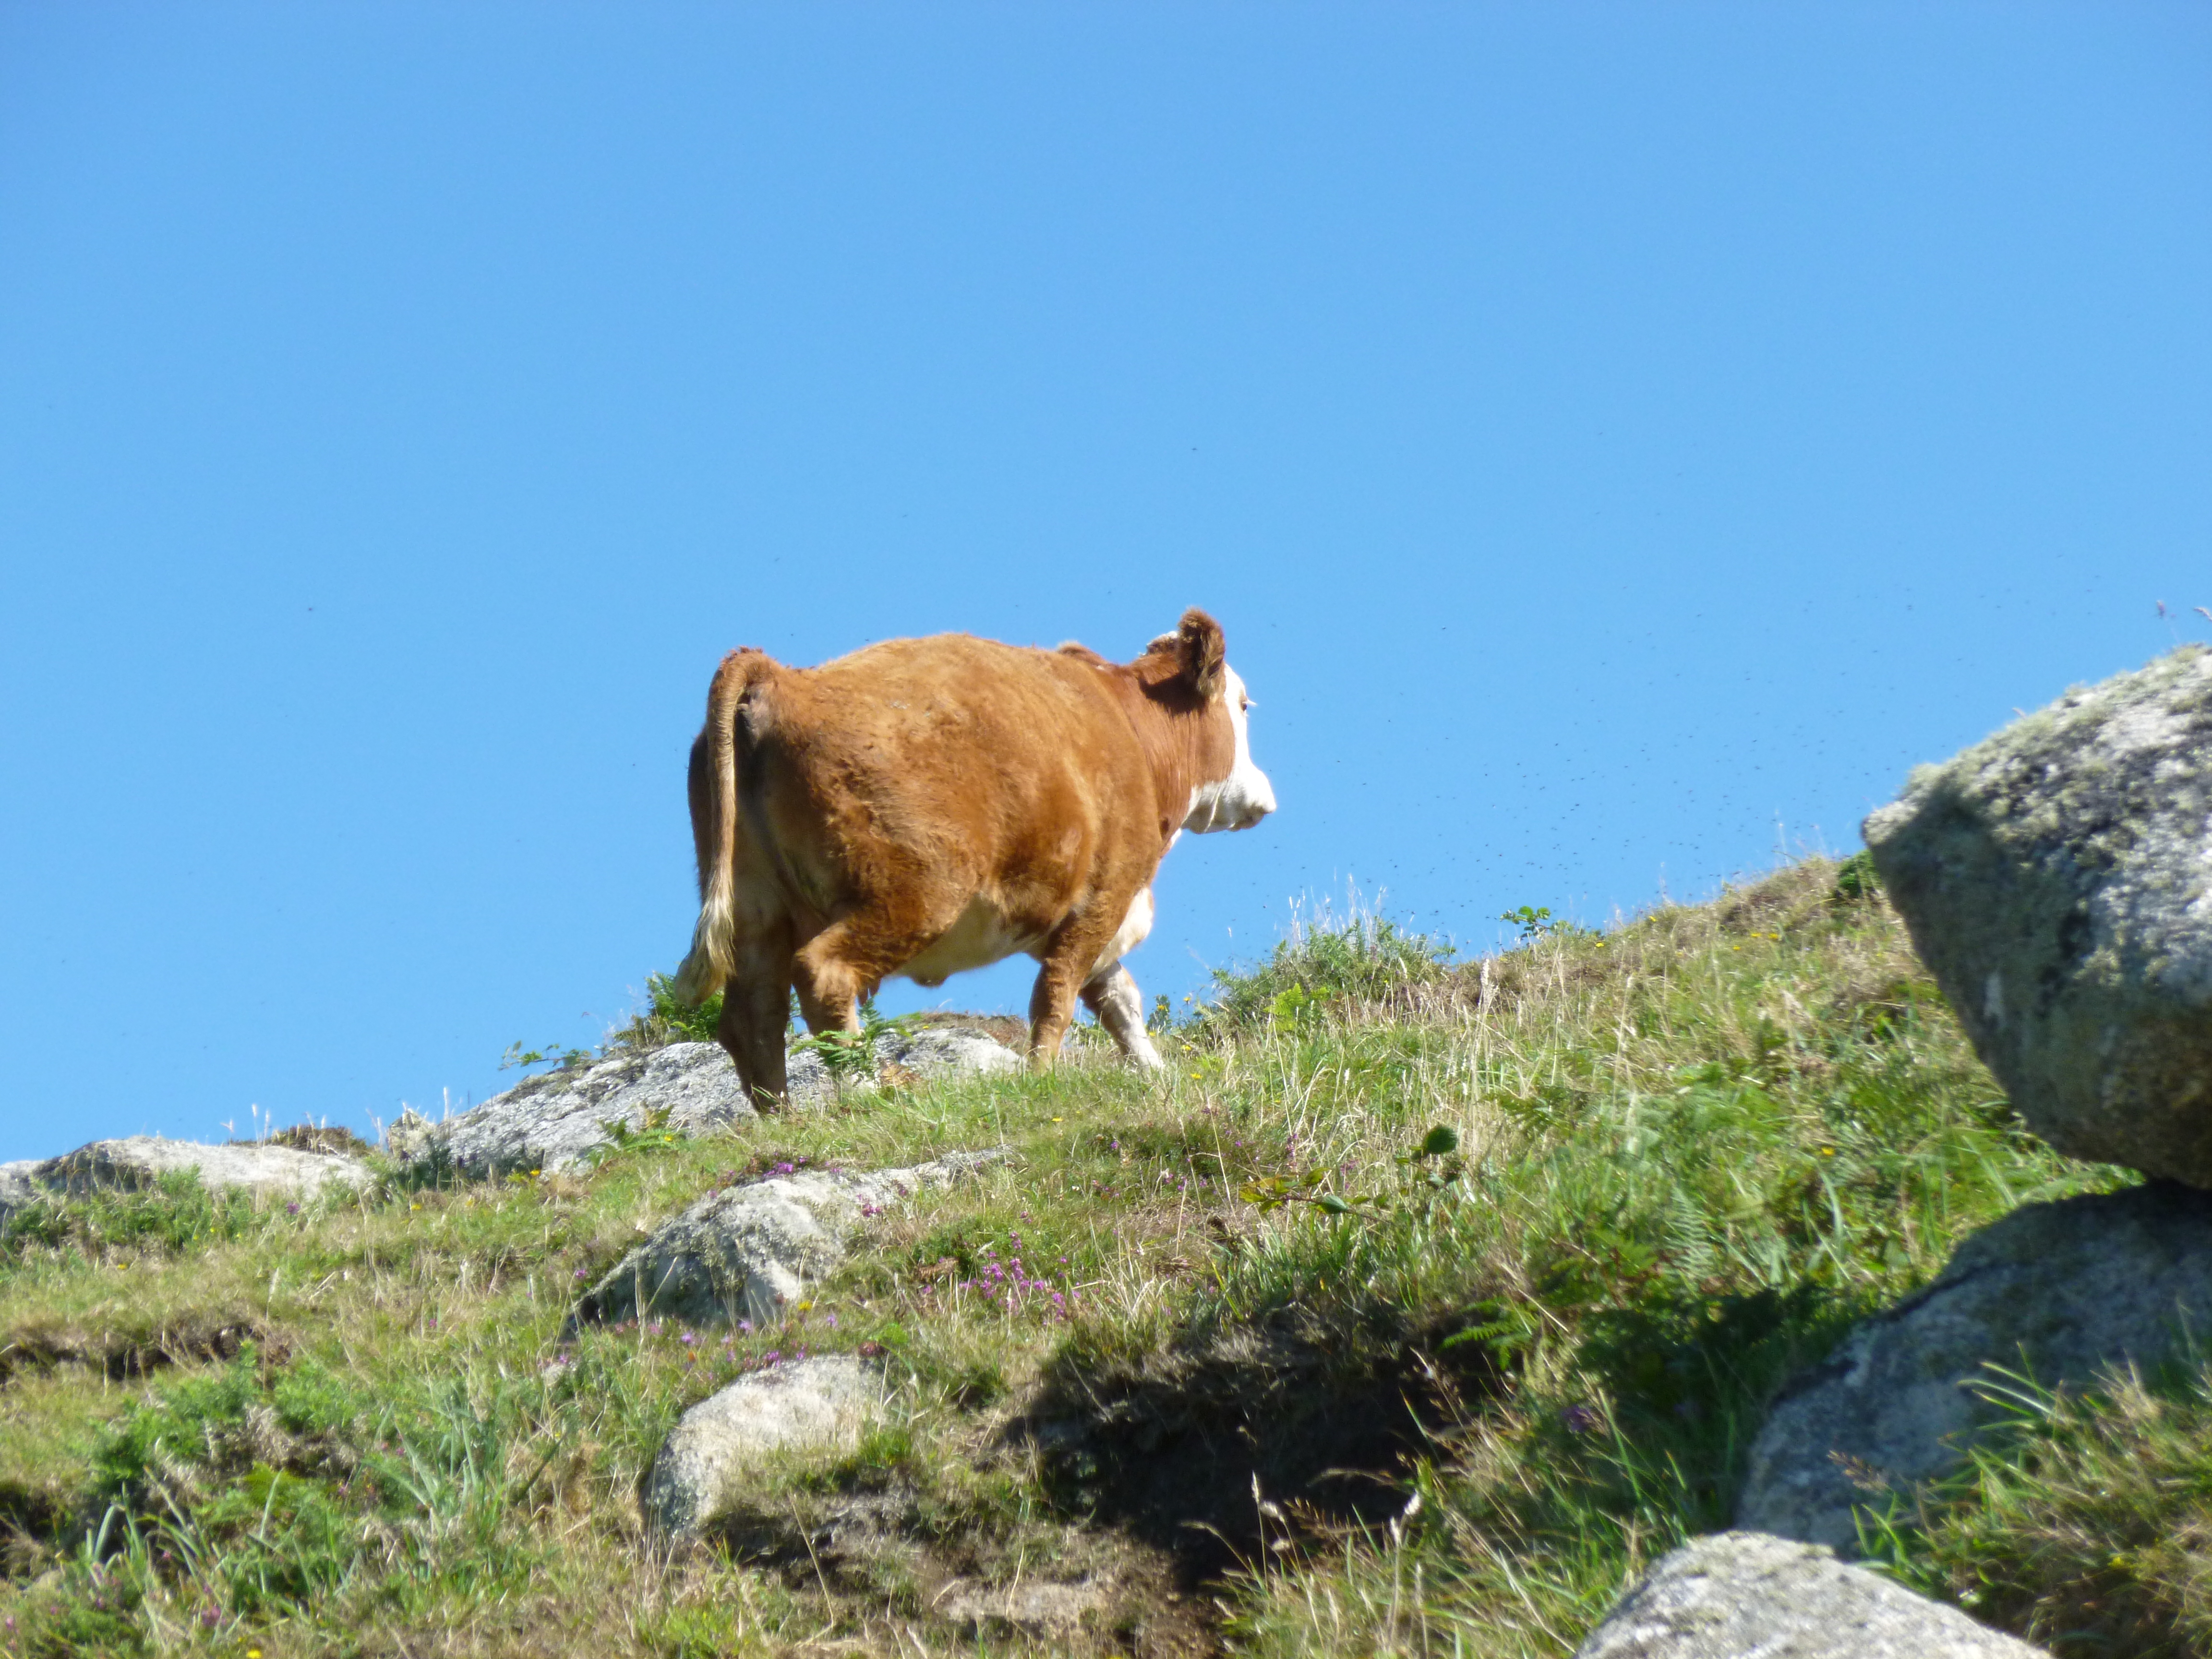 Cow climbing hill